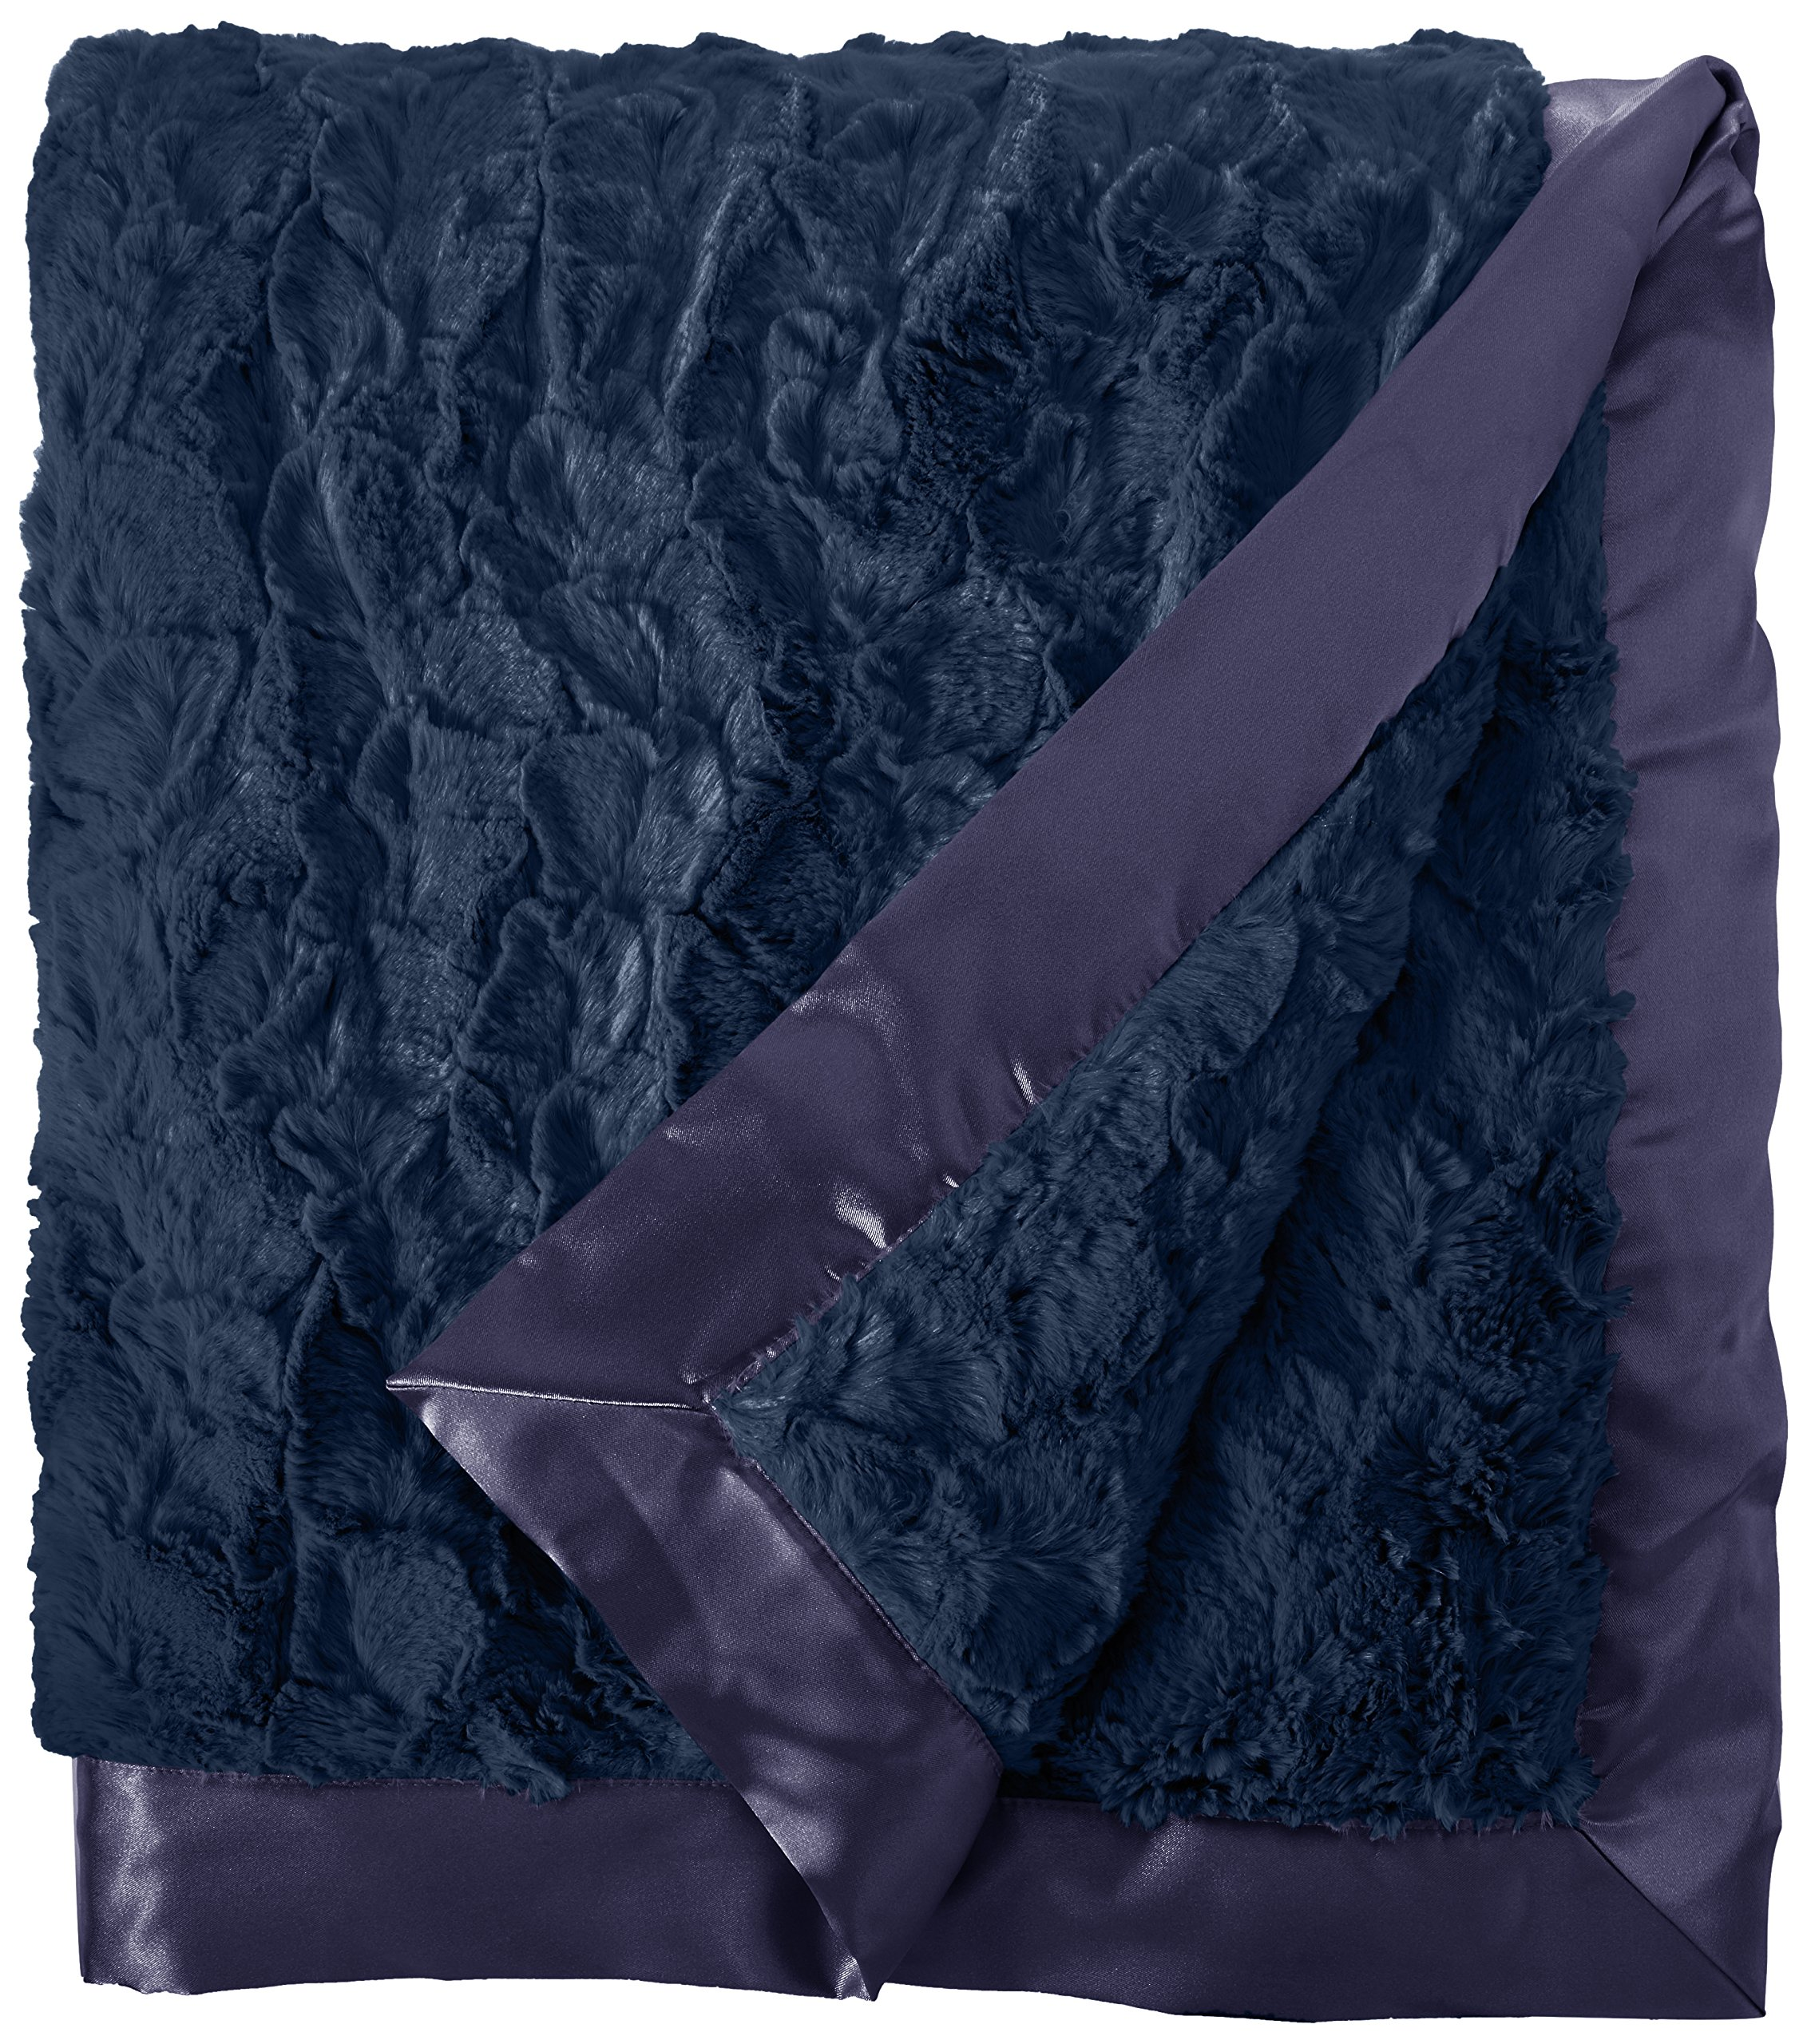 My Blankee Luxe Bella Super Throw Blanket, Navy, 60'' X 70'' by My Blankee (Image #1)